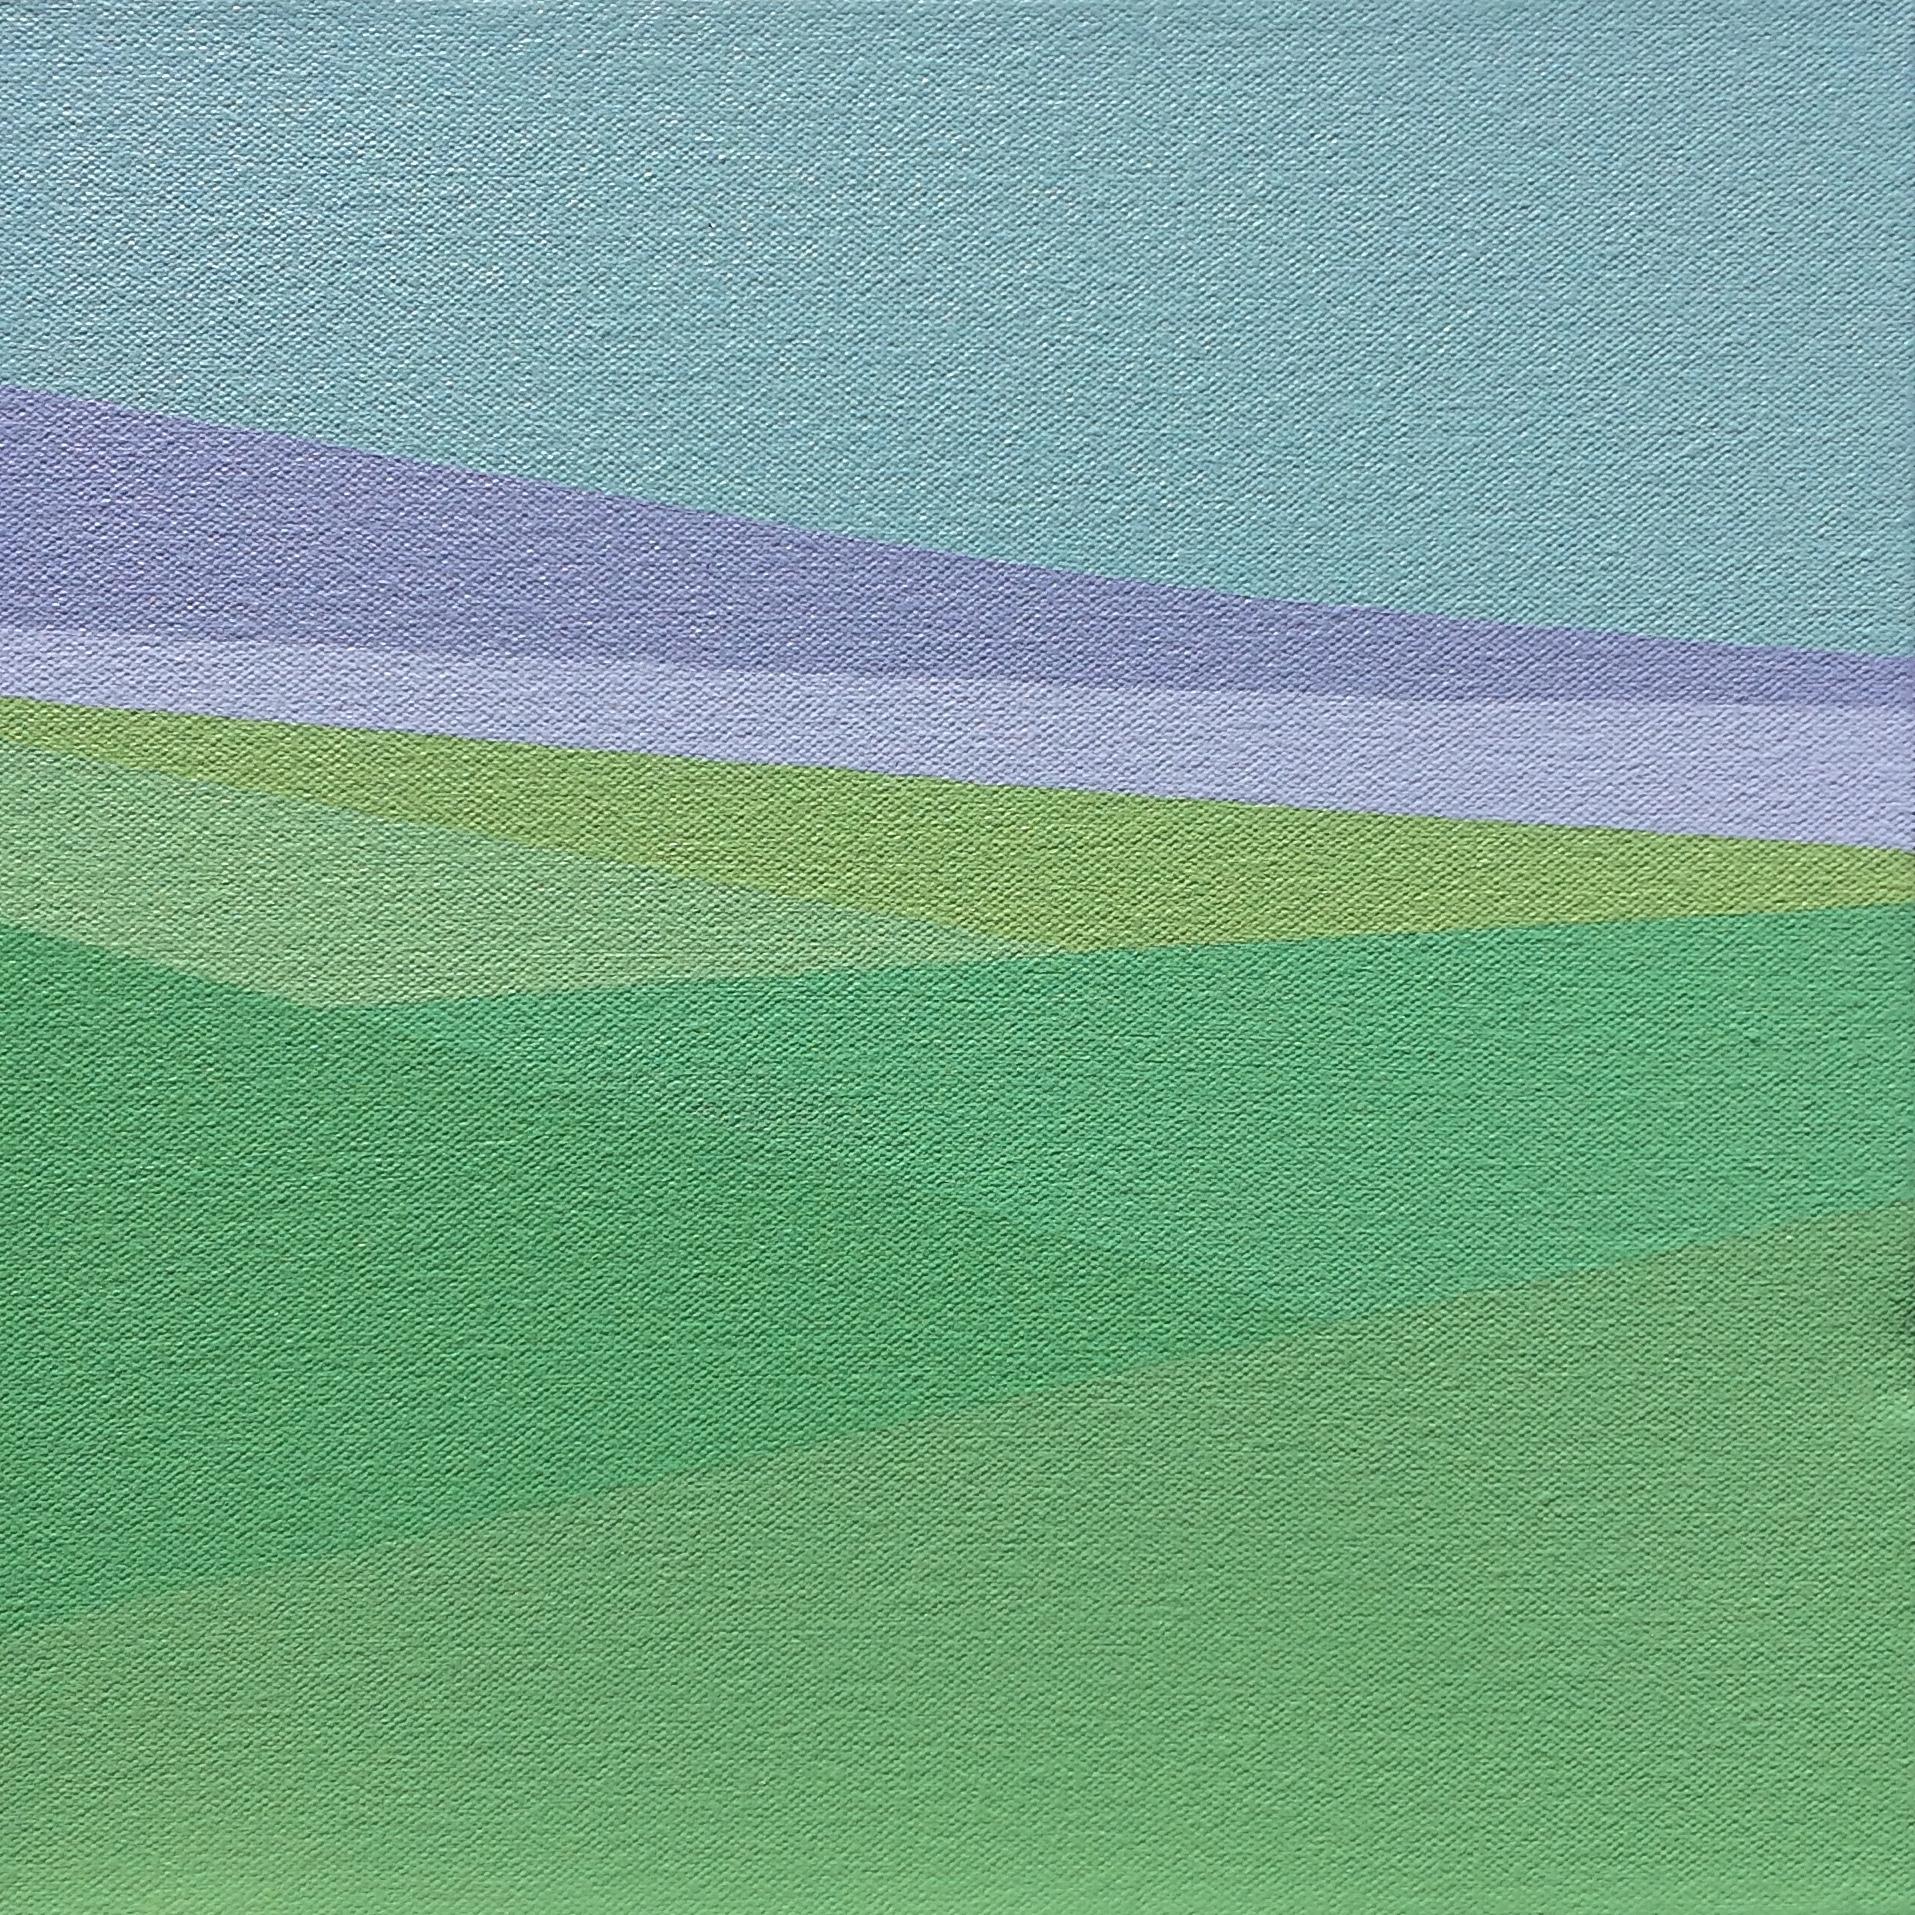 "Purple Cloud, 2017, 10"" X 10"", Acrylic on canvas"